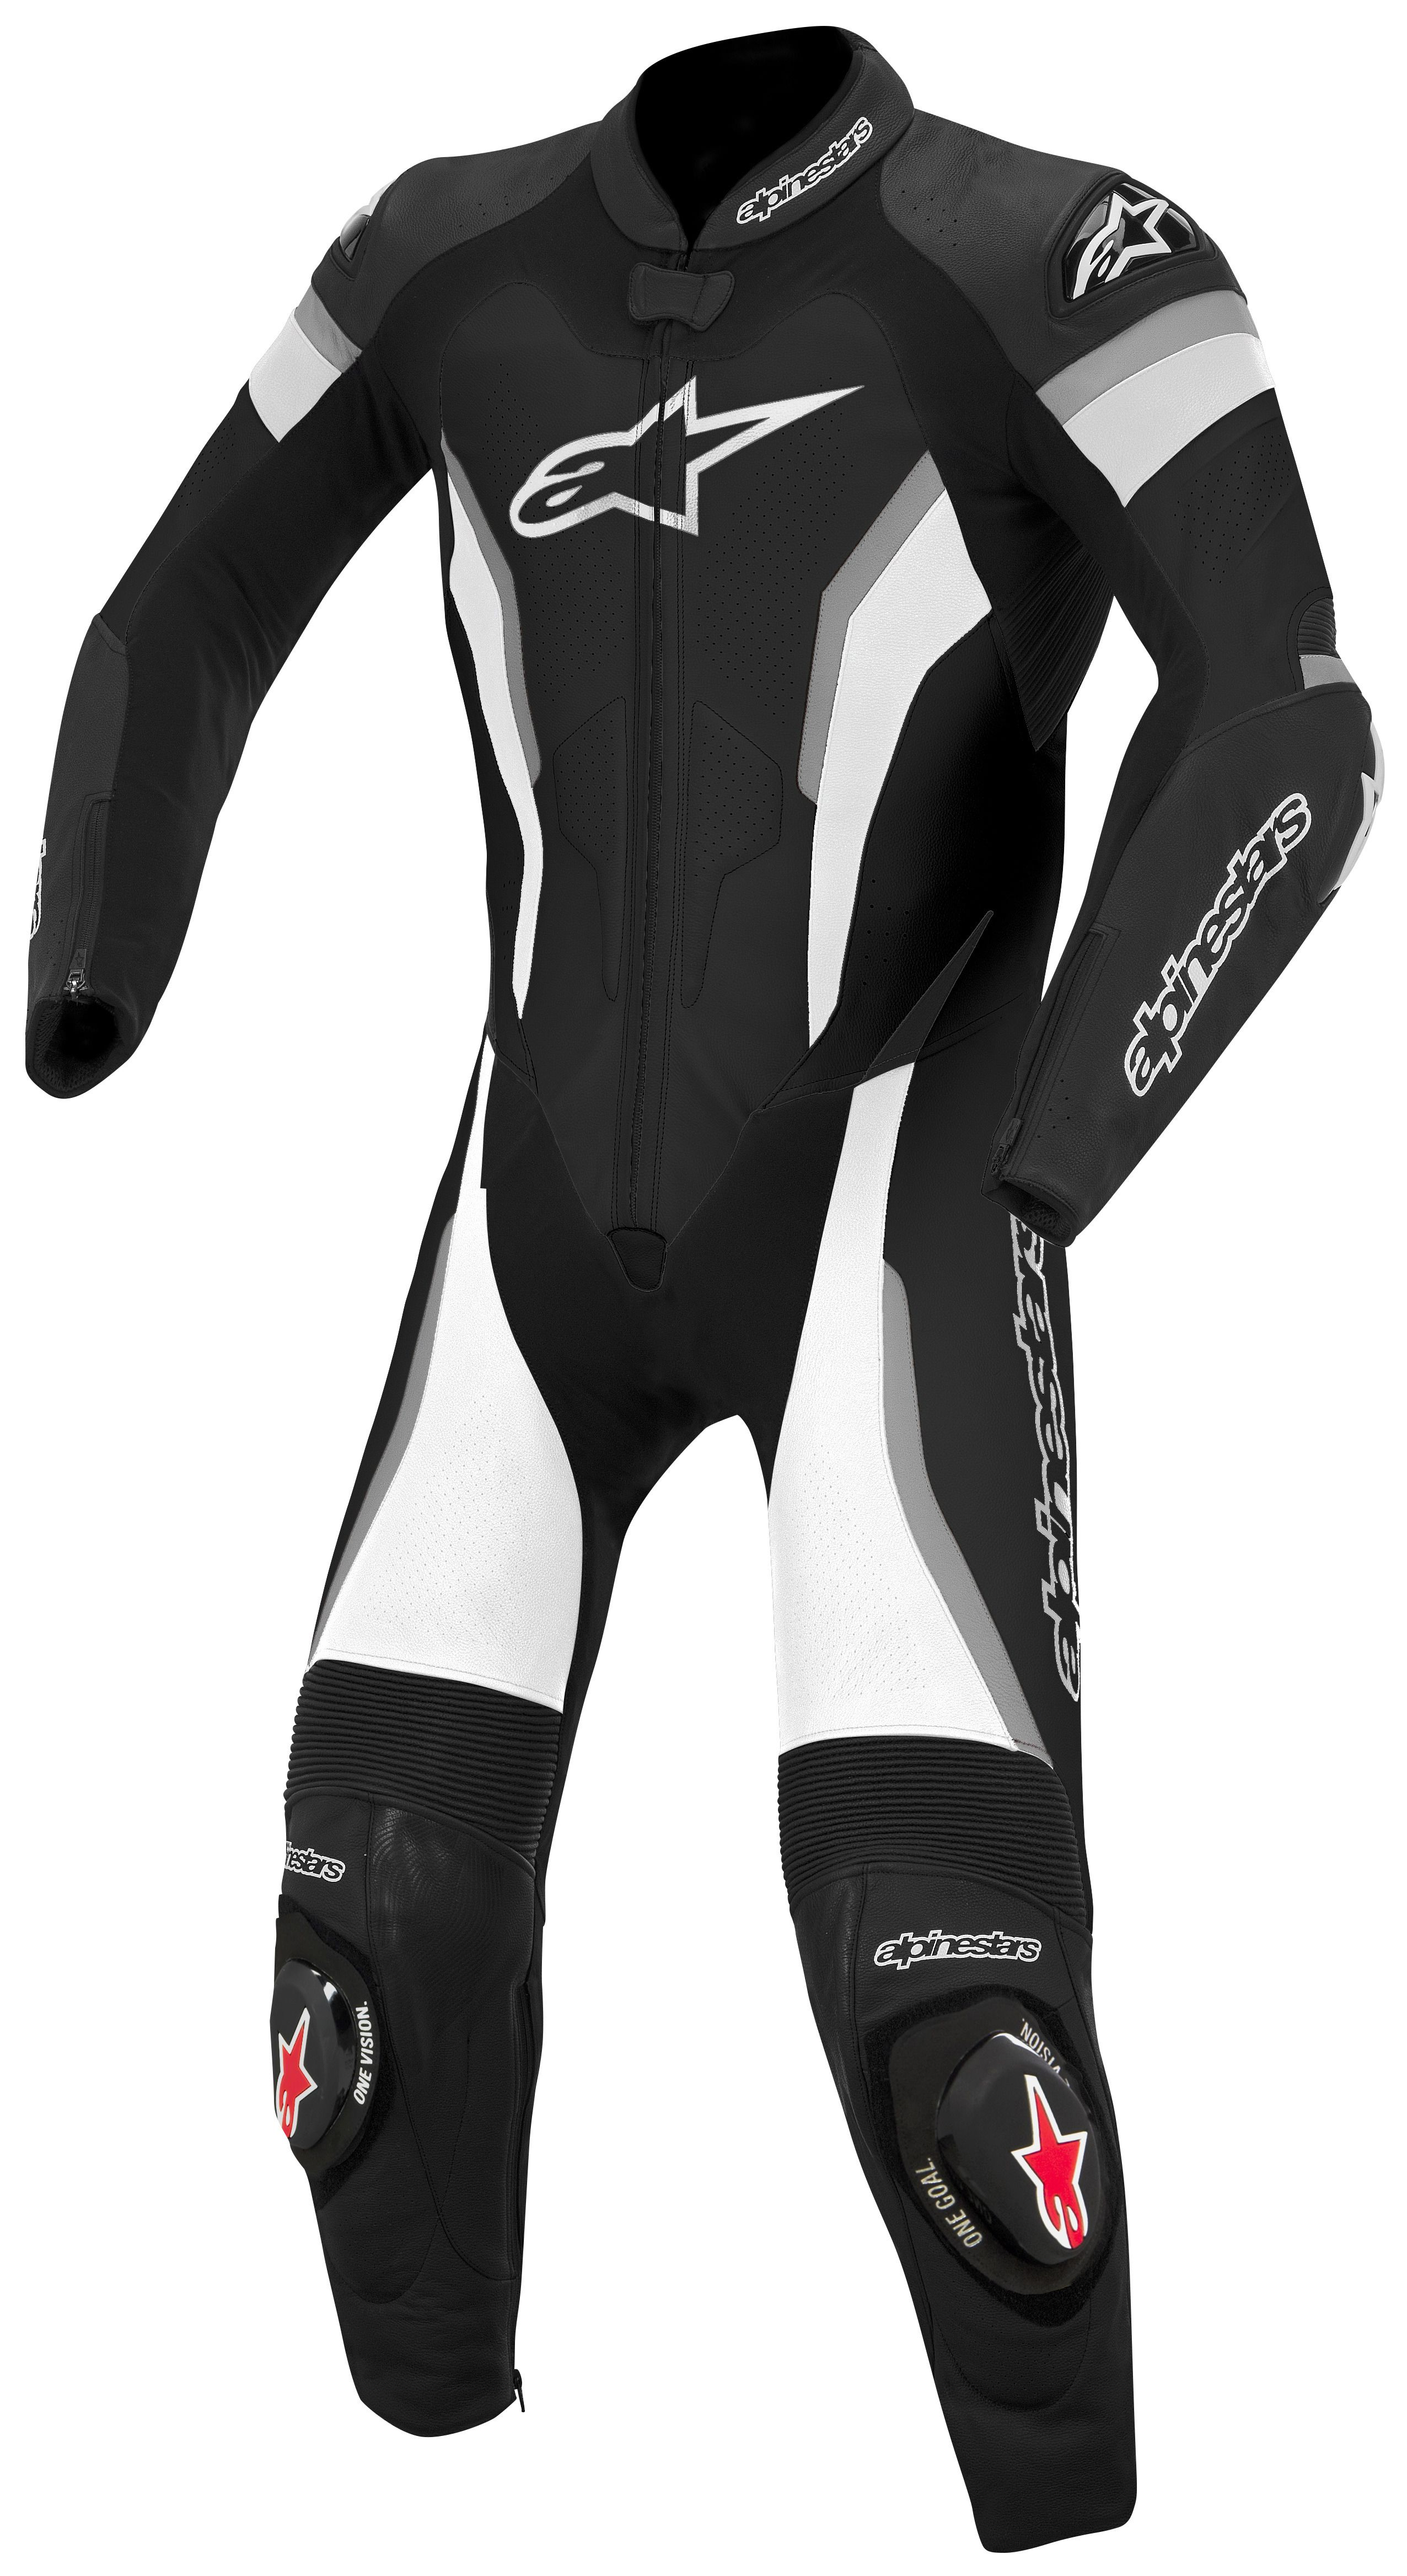 Alpinestars Gp Pro Race Suit Cycle Gear